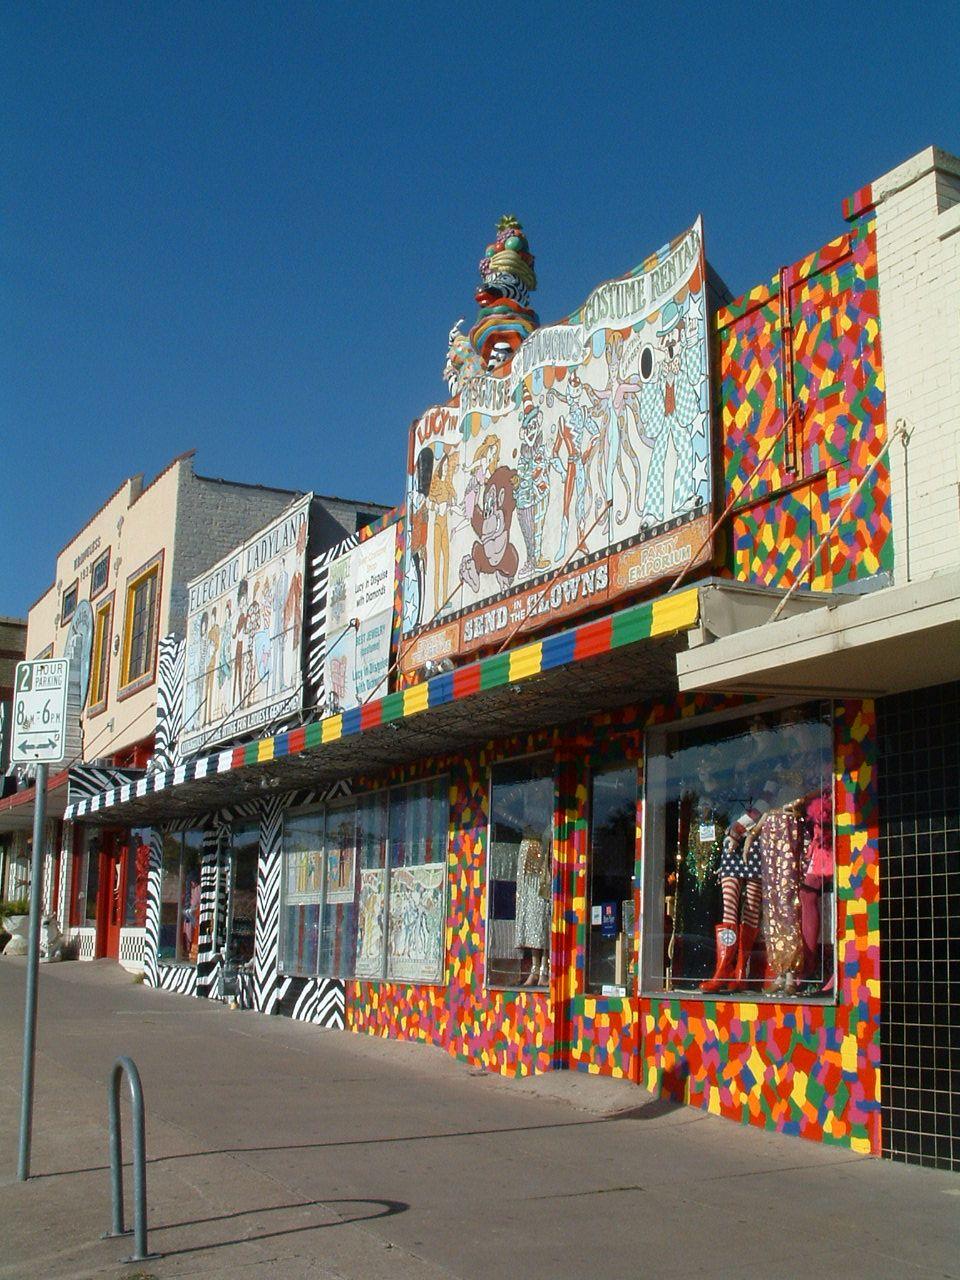 Austin Street Stores : austin, street, stores, (South, Congress), Neighborhood, Austin, Small, Planet, Guide, Shopping,, South, Congress, Austin,, Downtown